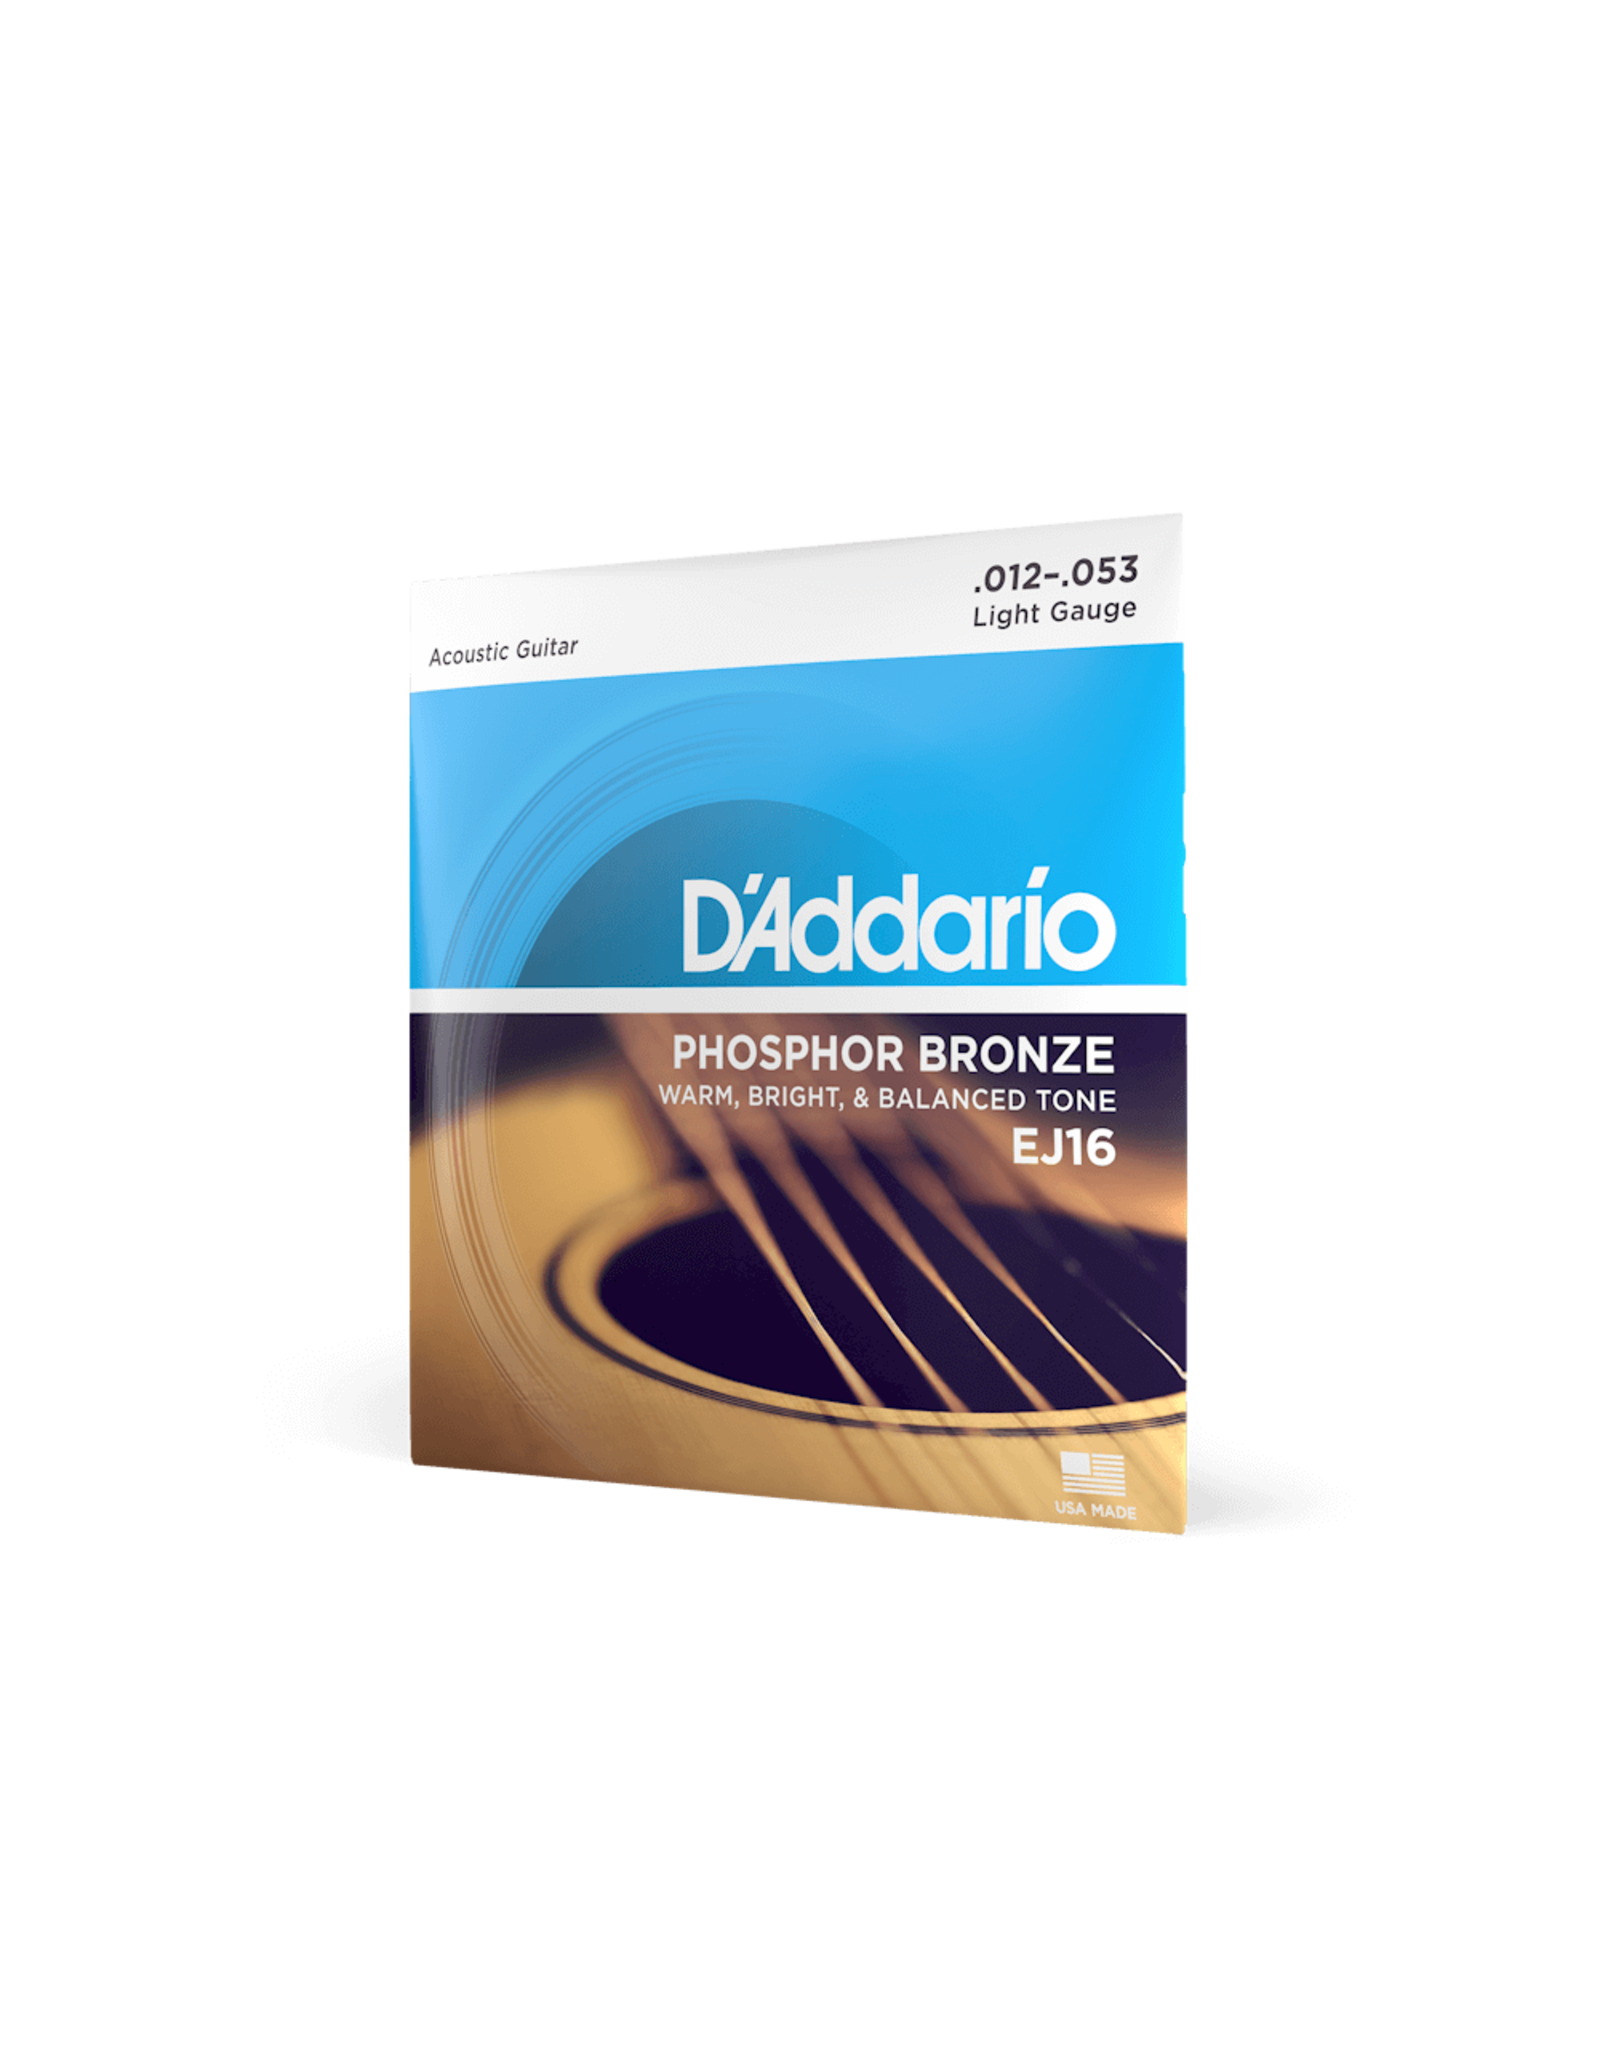 D'Addario D'Addario EJ16 Phosphor Bronze Regular Light Acoustic Strings 12-53